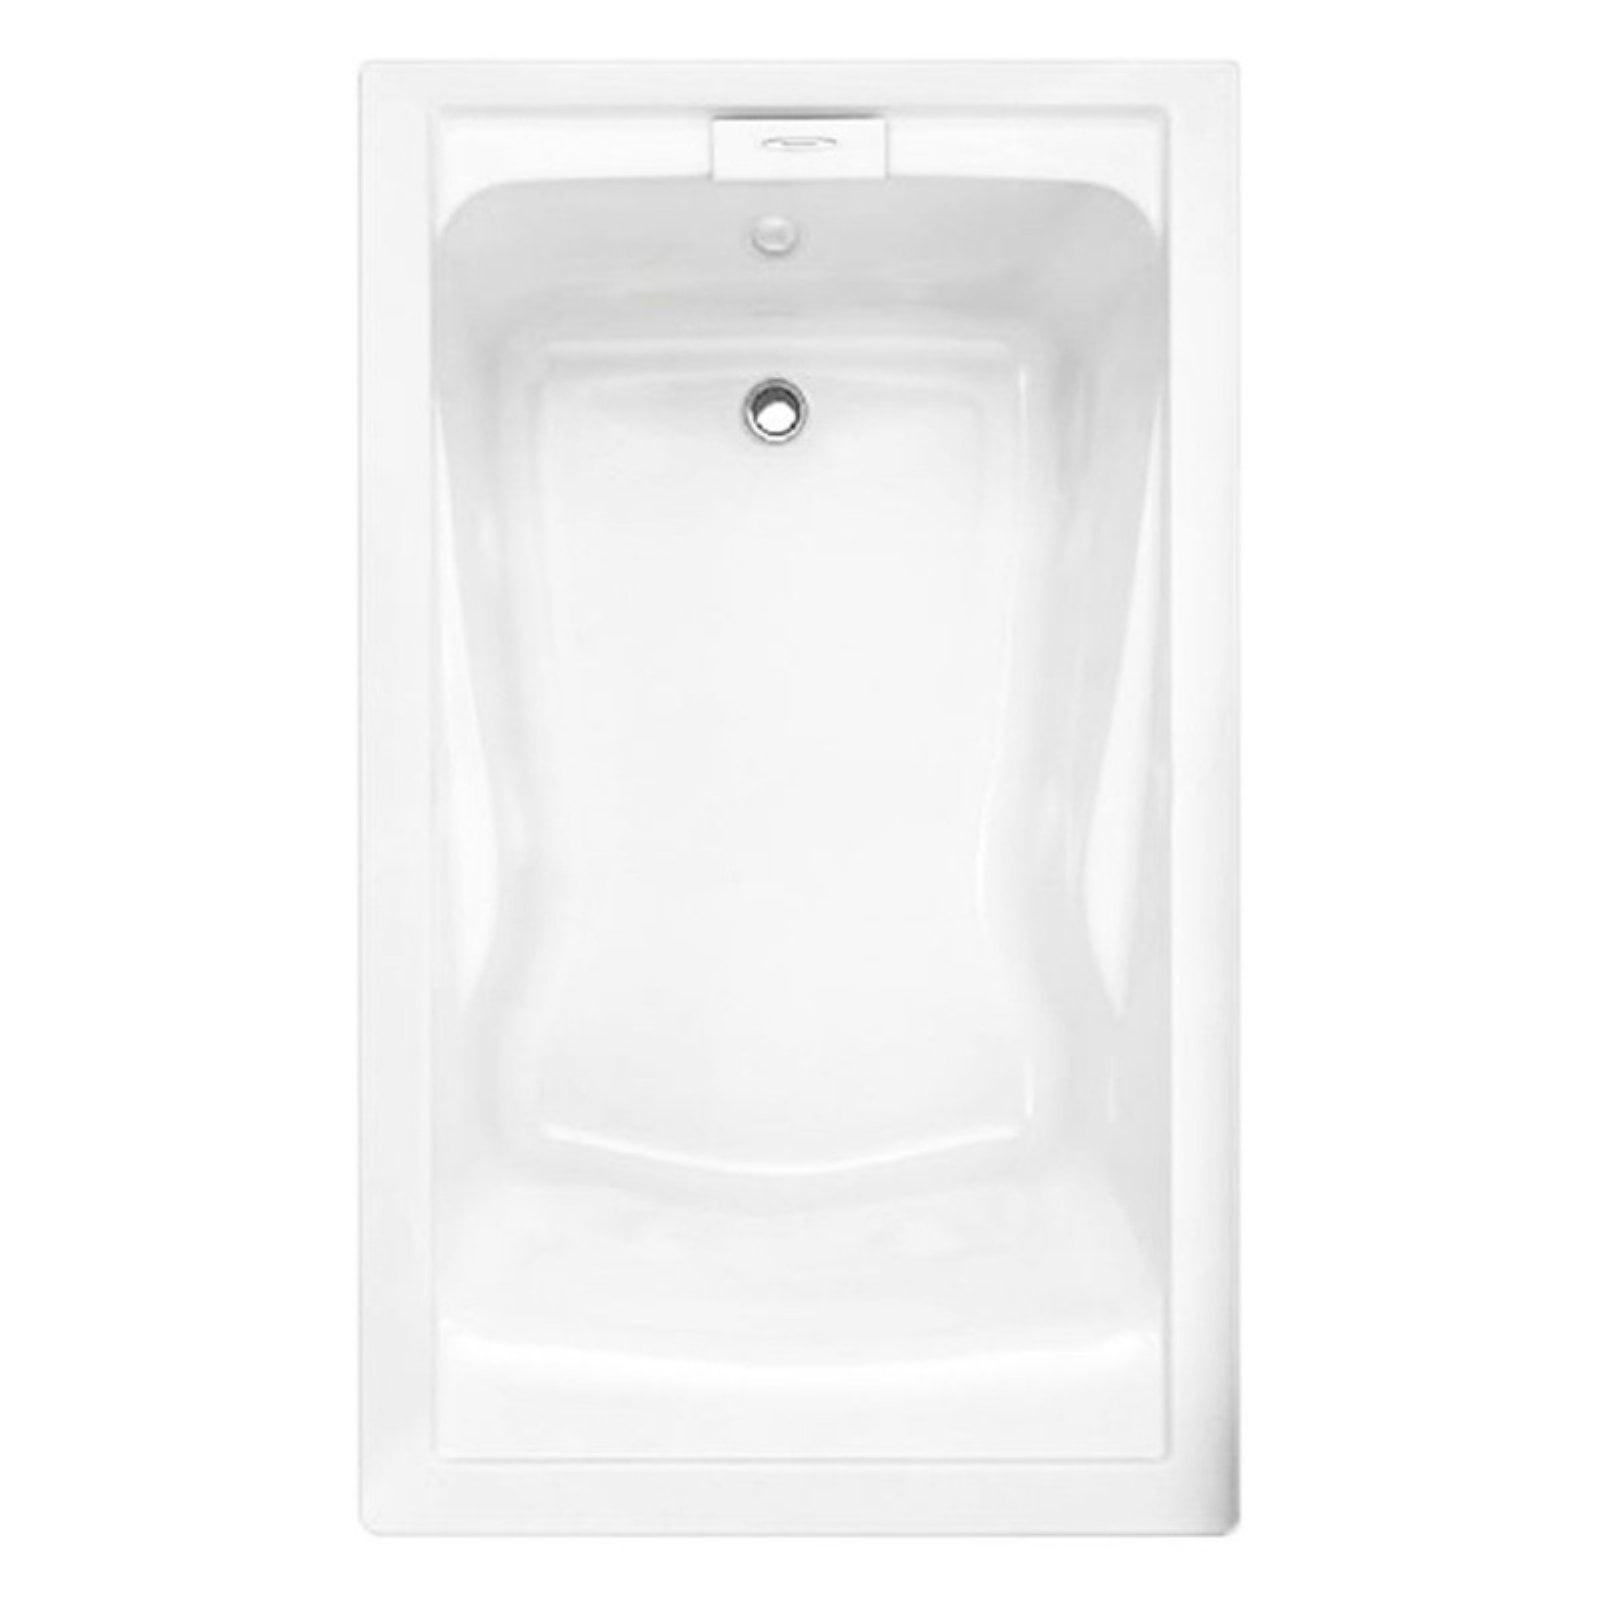 American Standard Evolution 2771V.002.020 60 in. Soaking Bathtub image